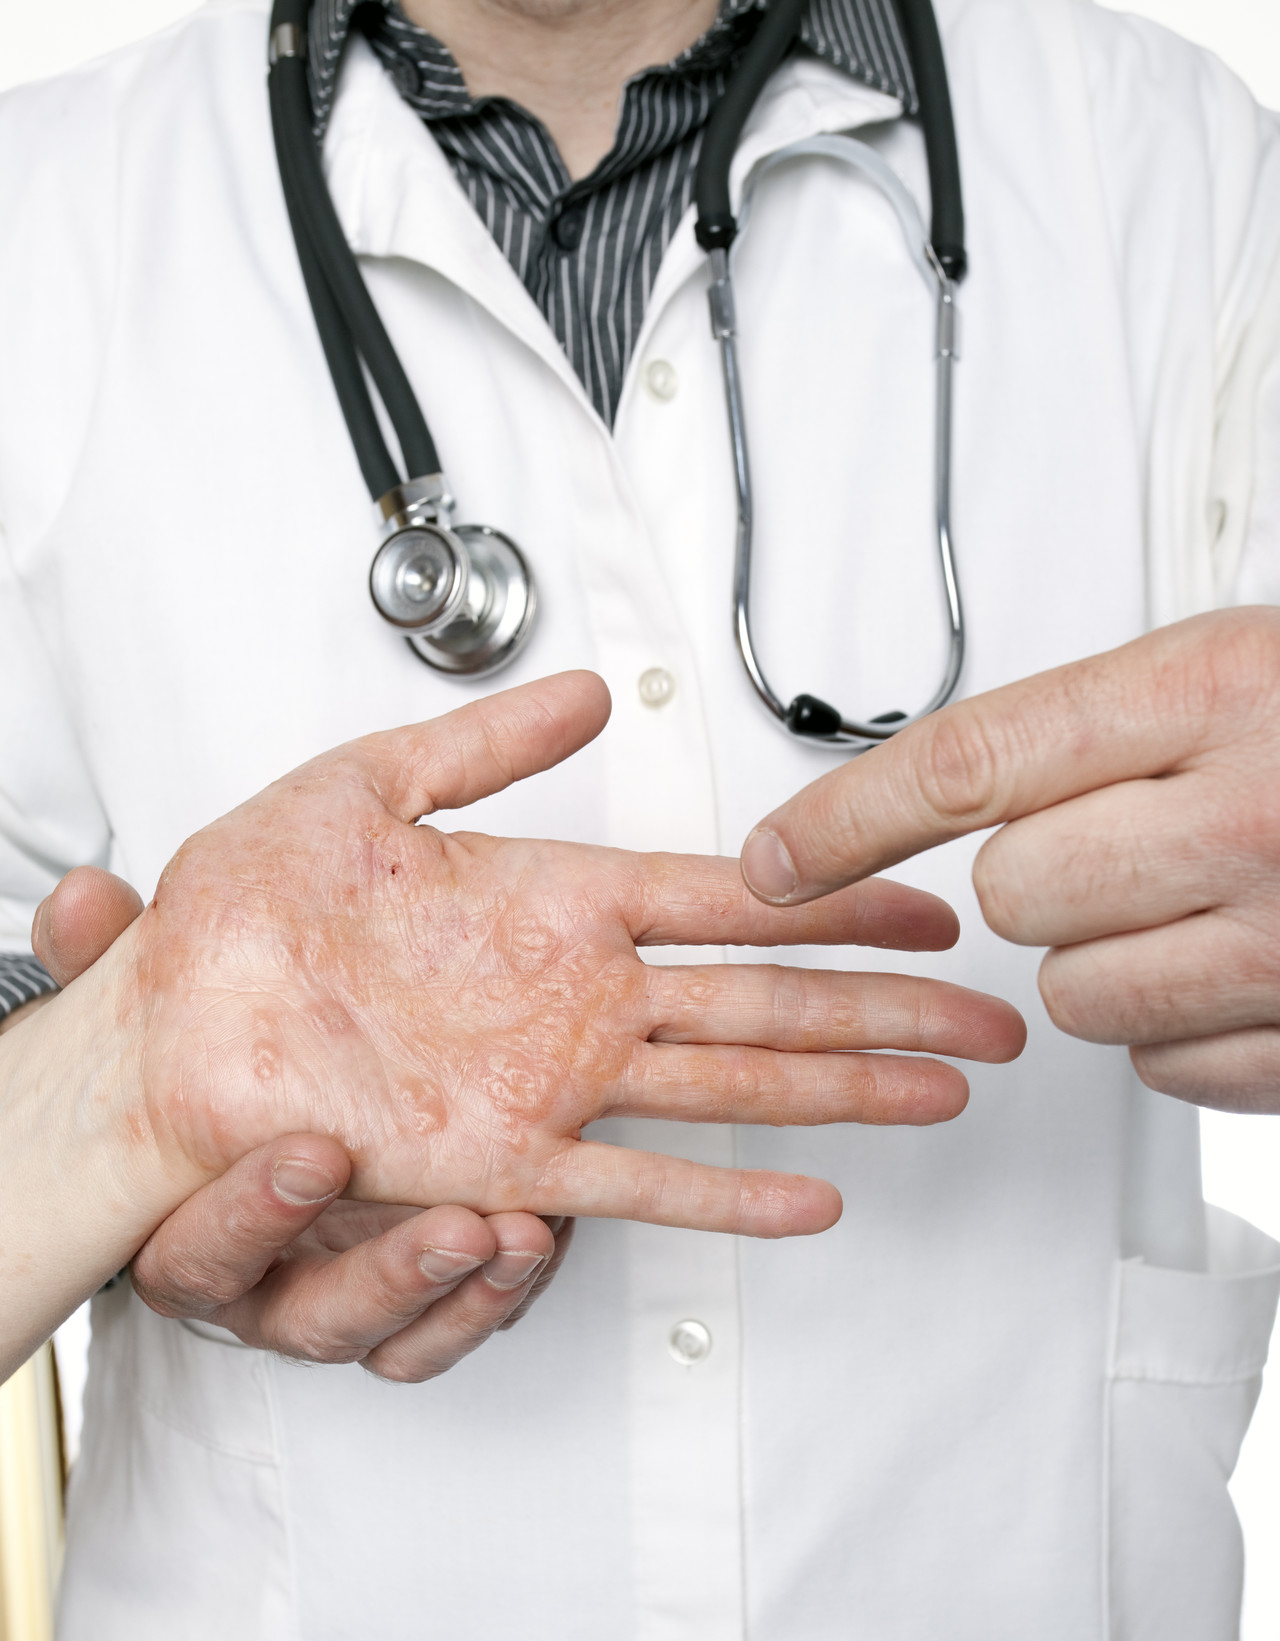 eczema injection treatment adult